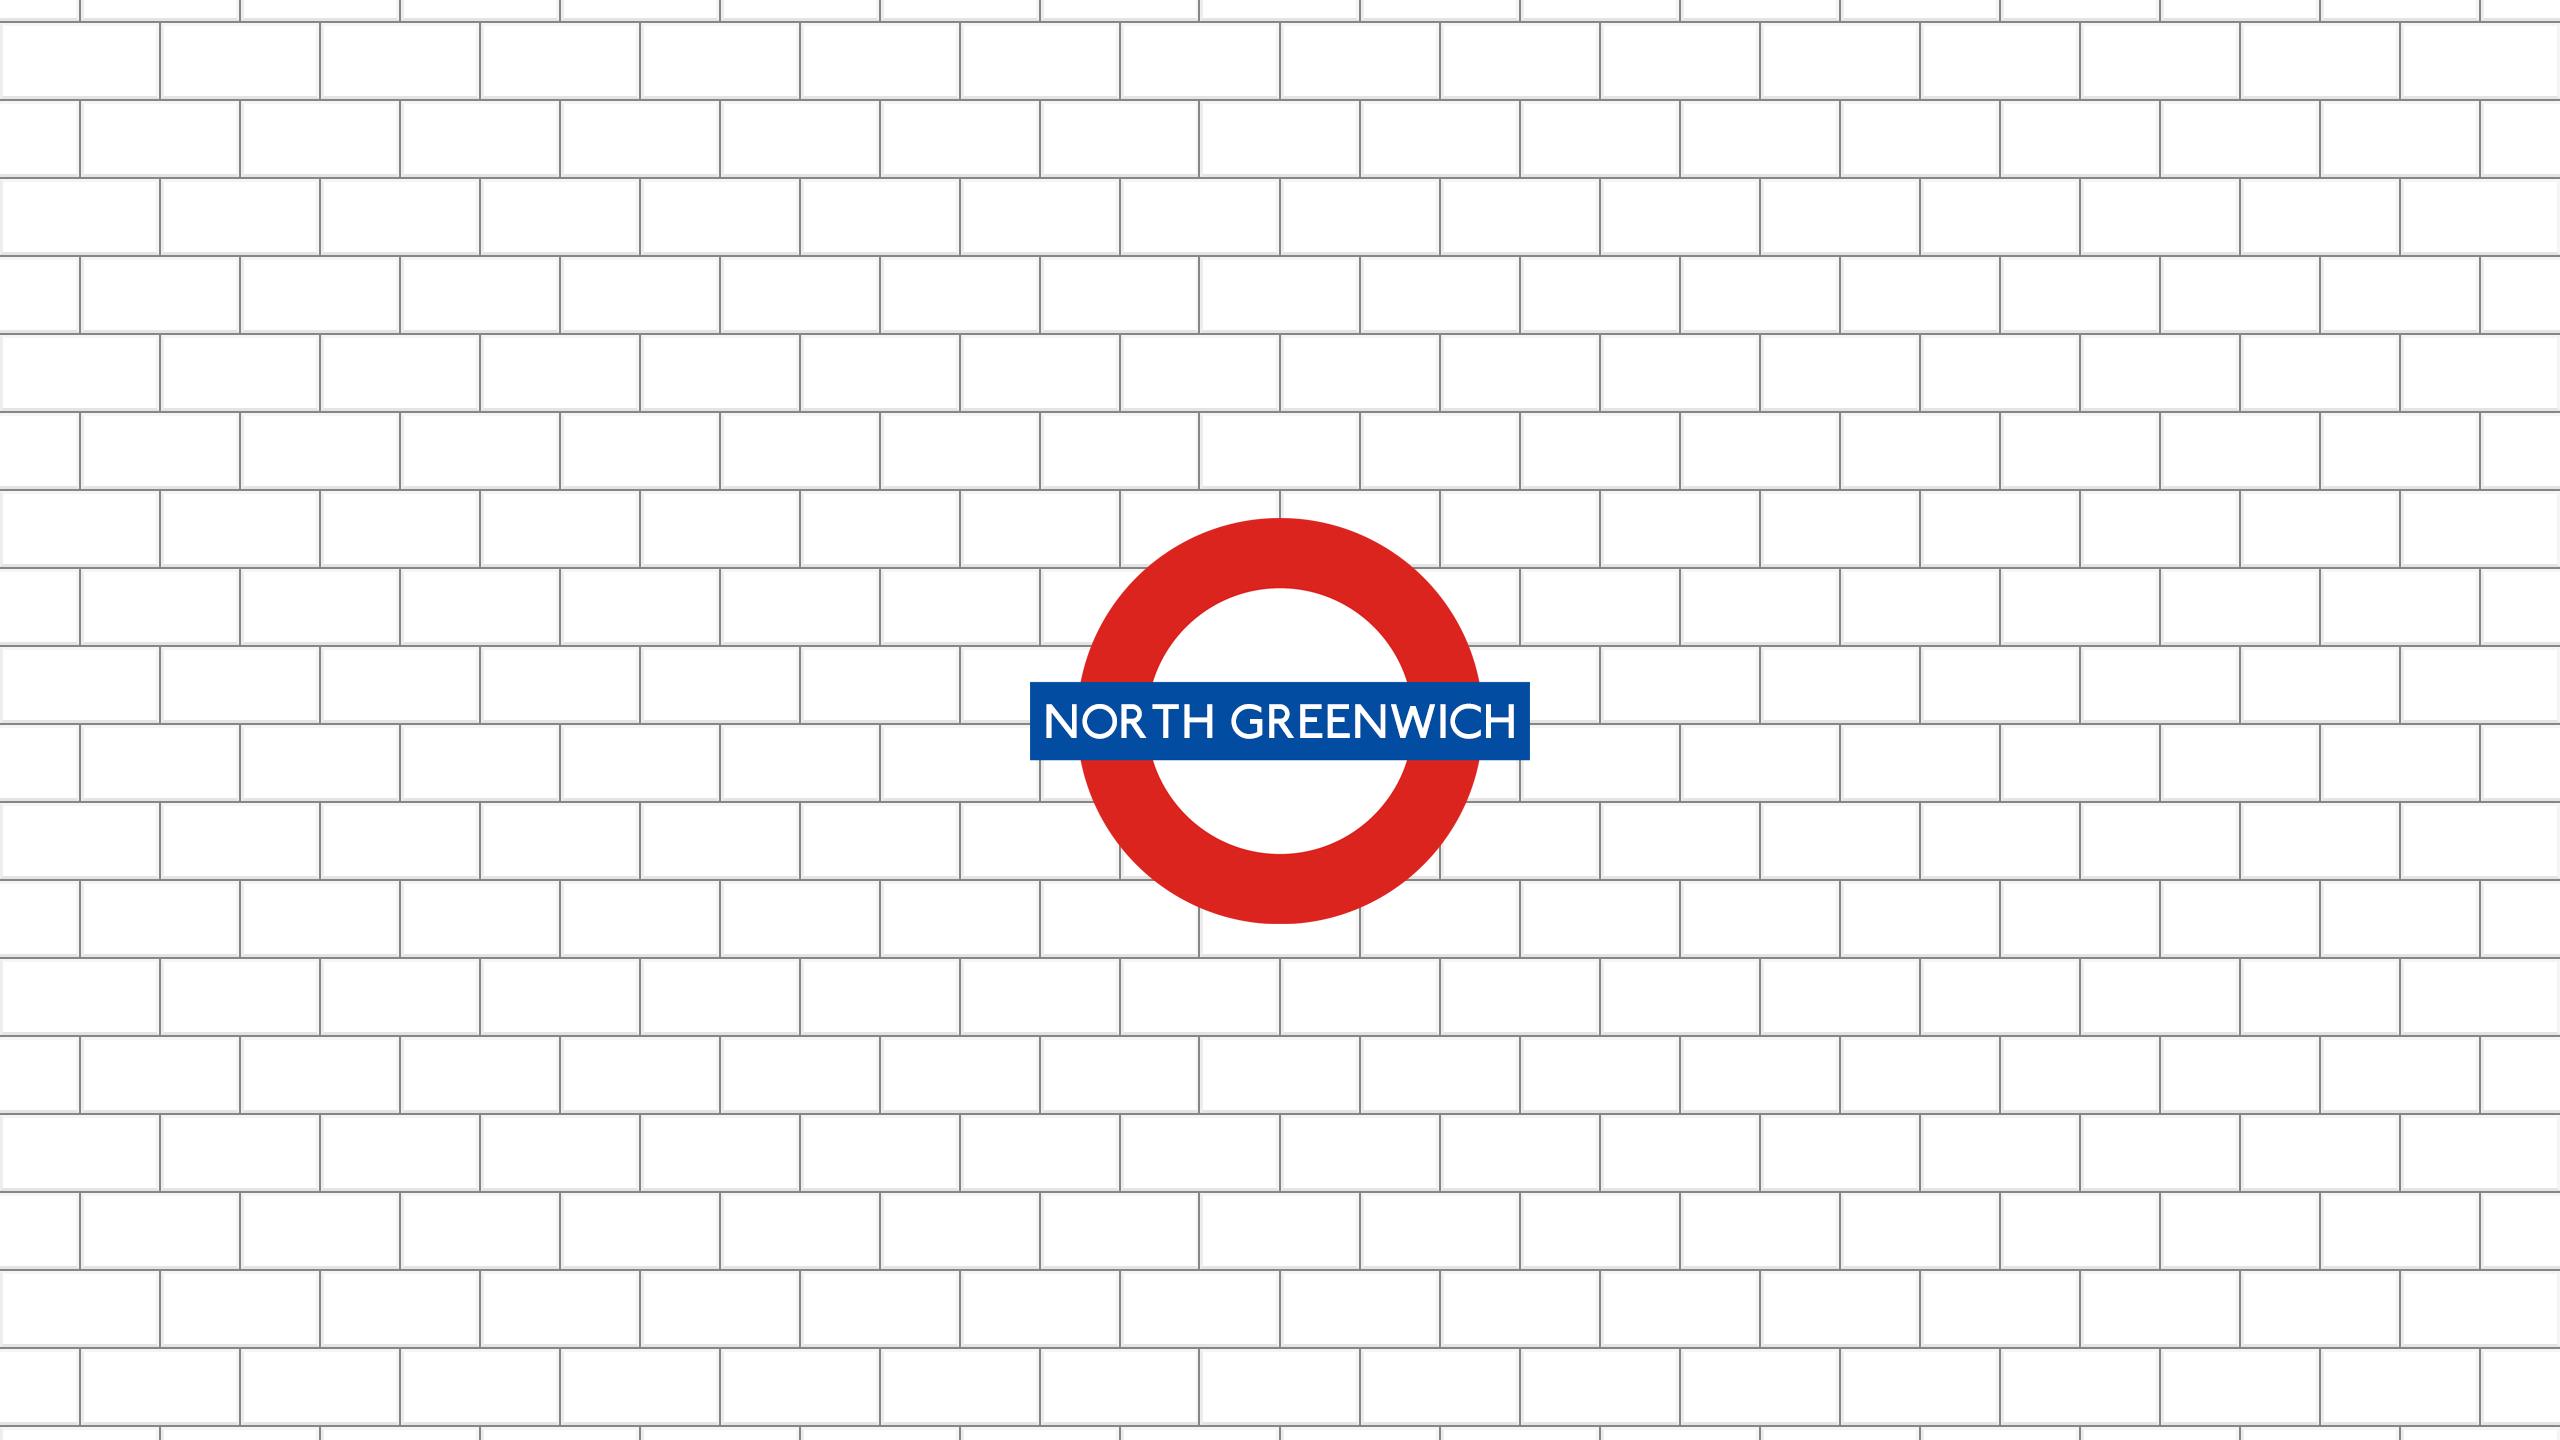 North Greenwich